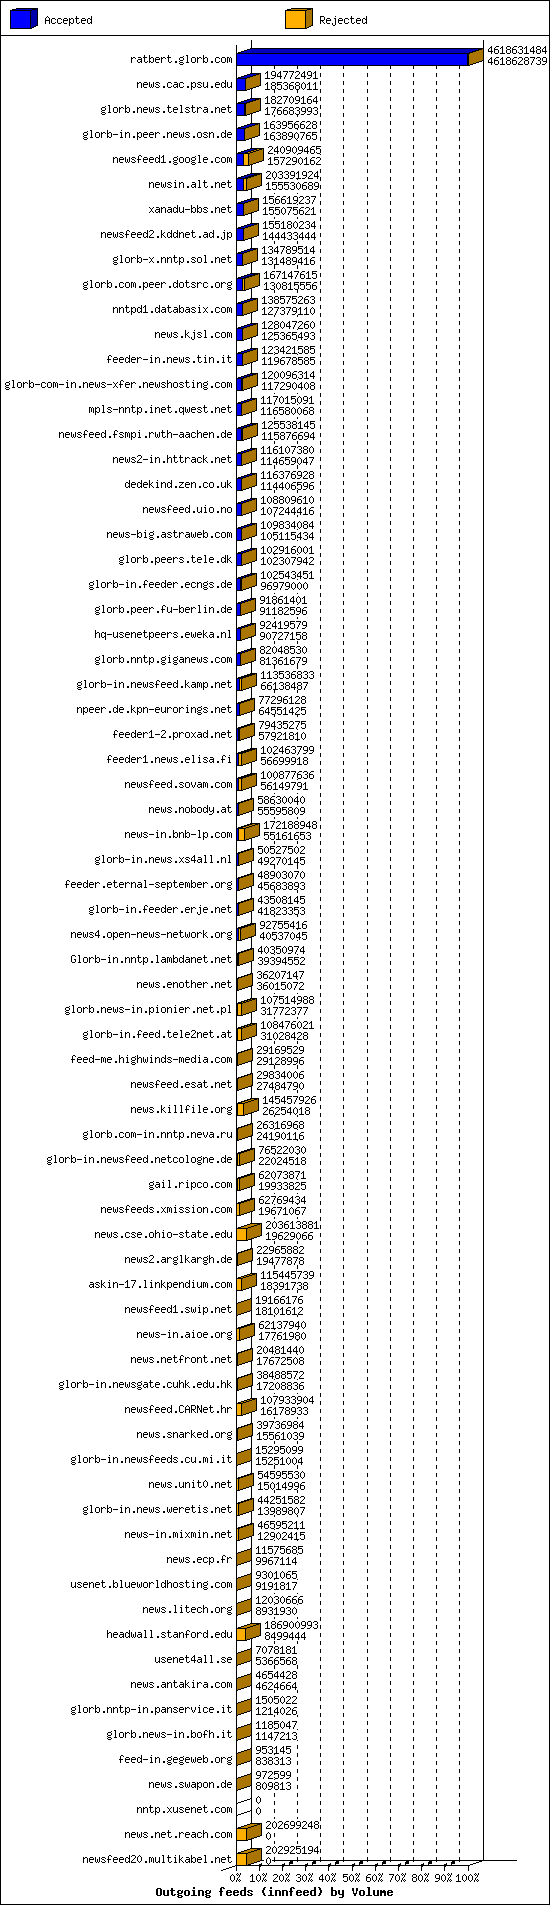 "xusenet.com alt.binaries.6"" alt binary bc series"